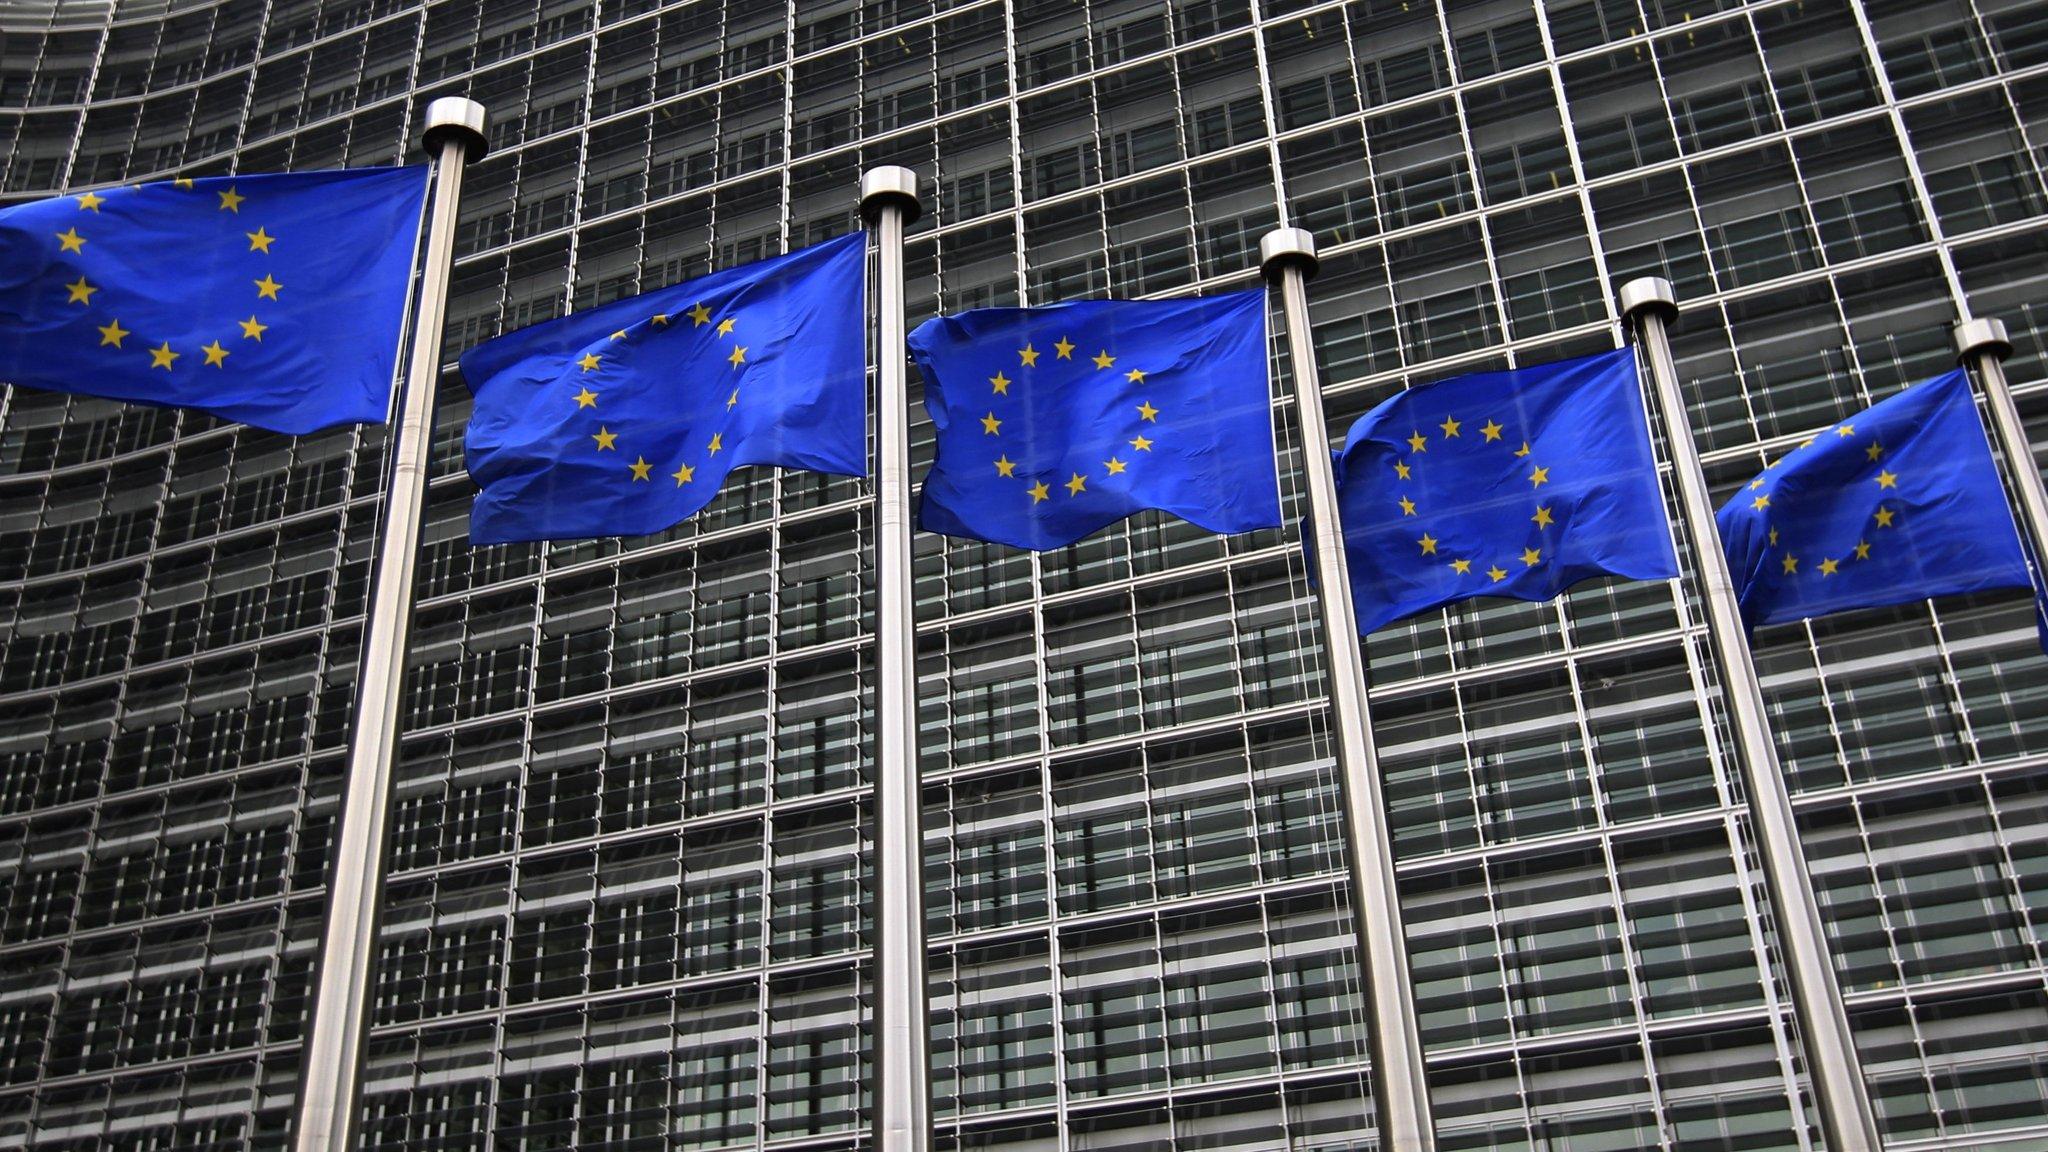 EU targets tech giants over unfair business practices